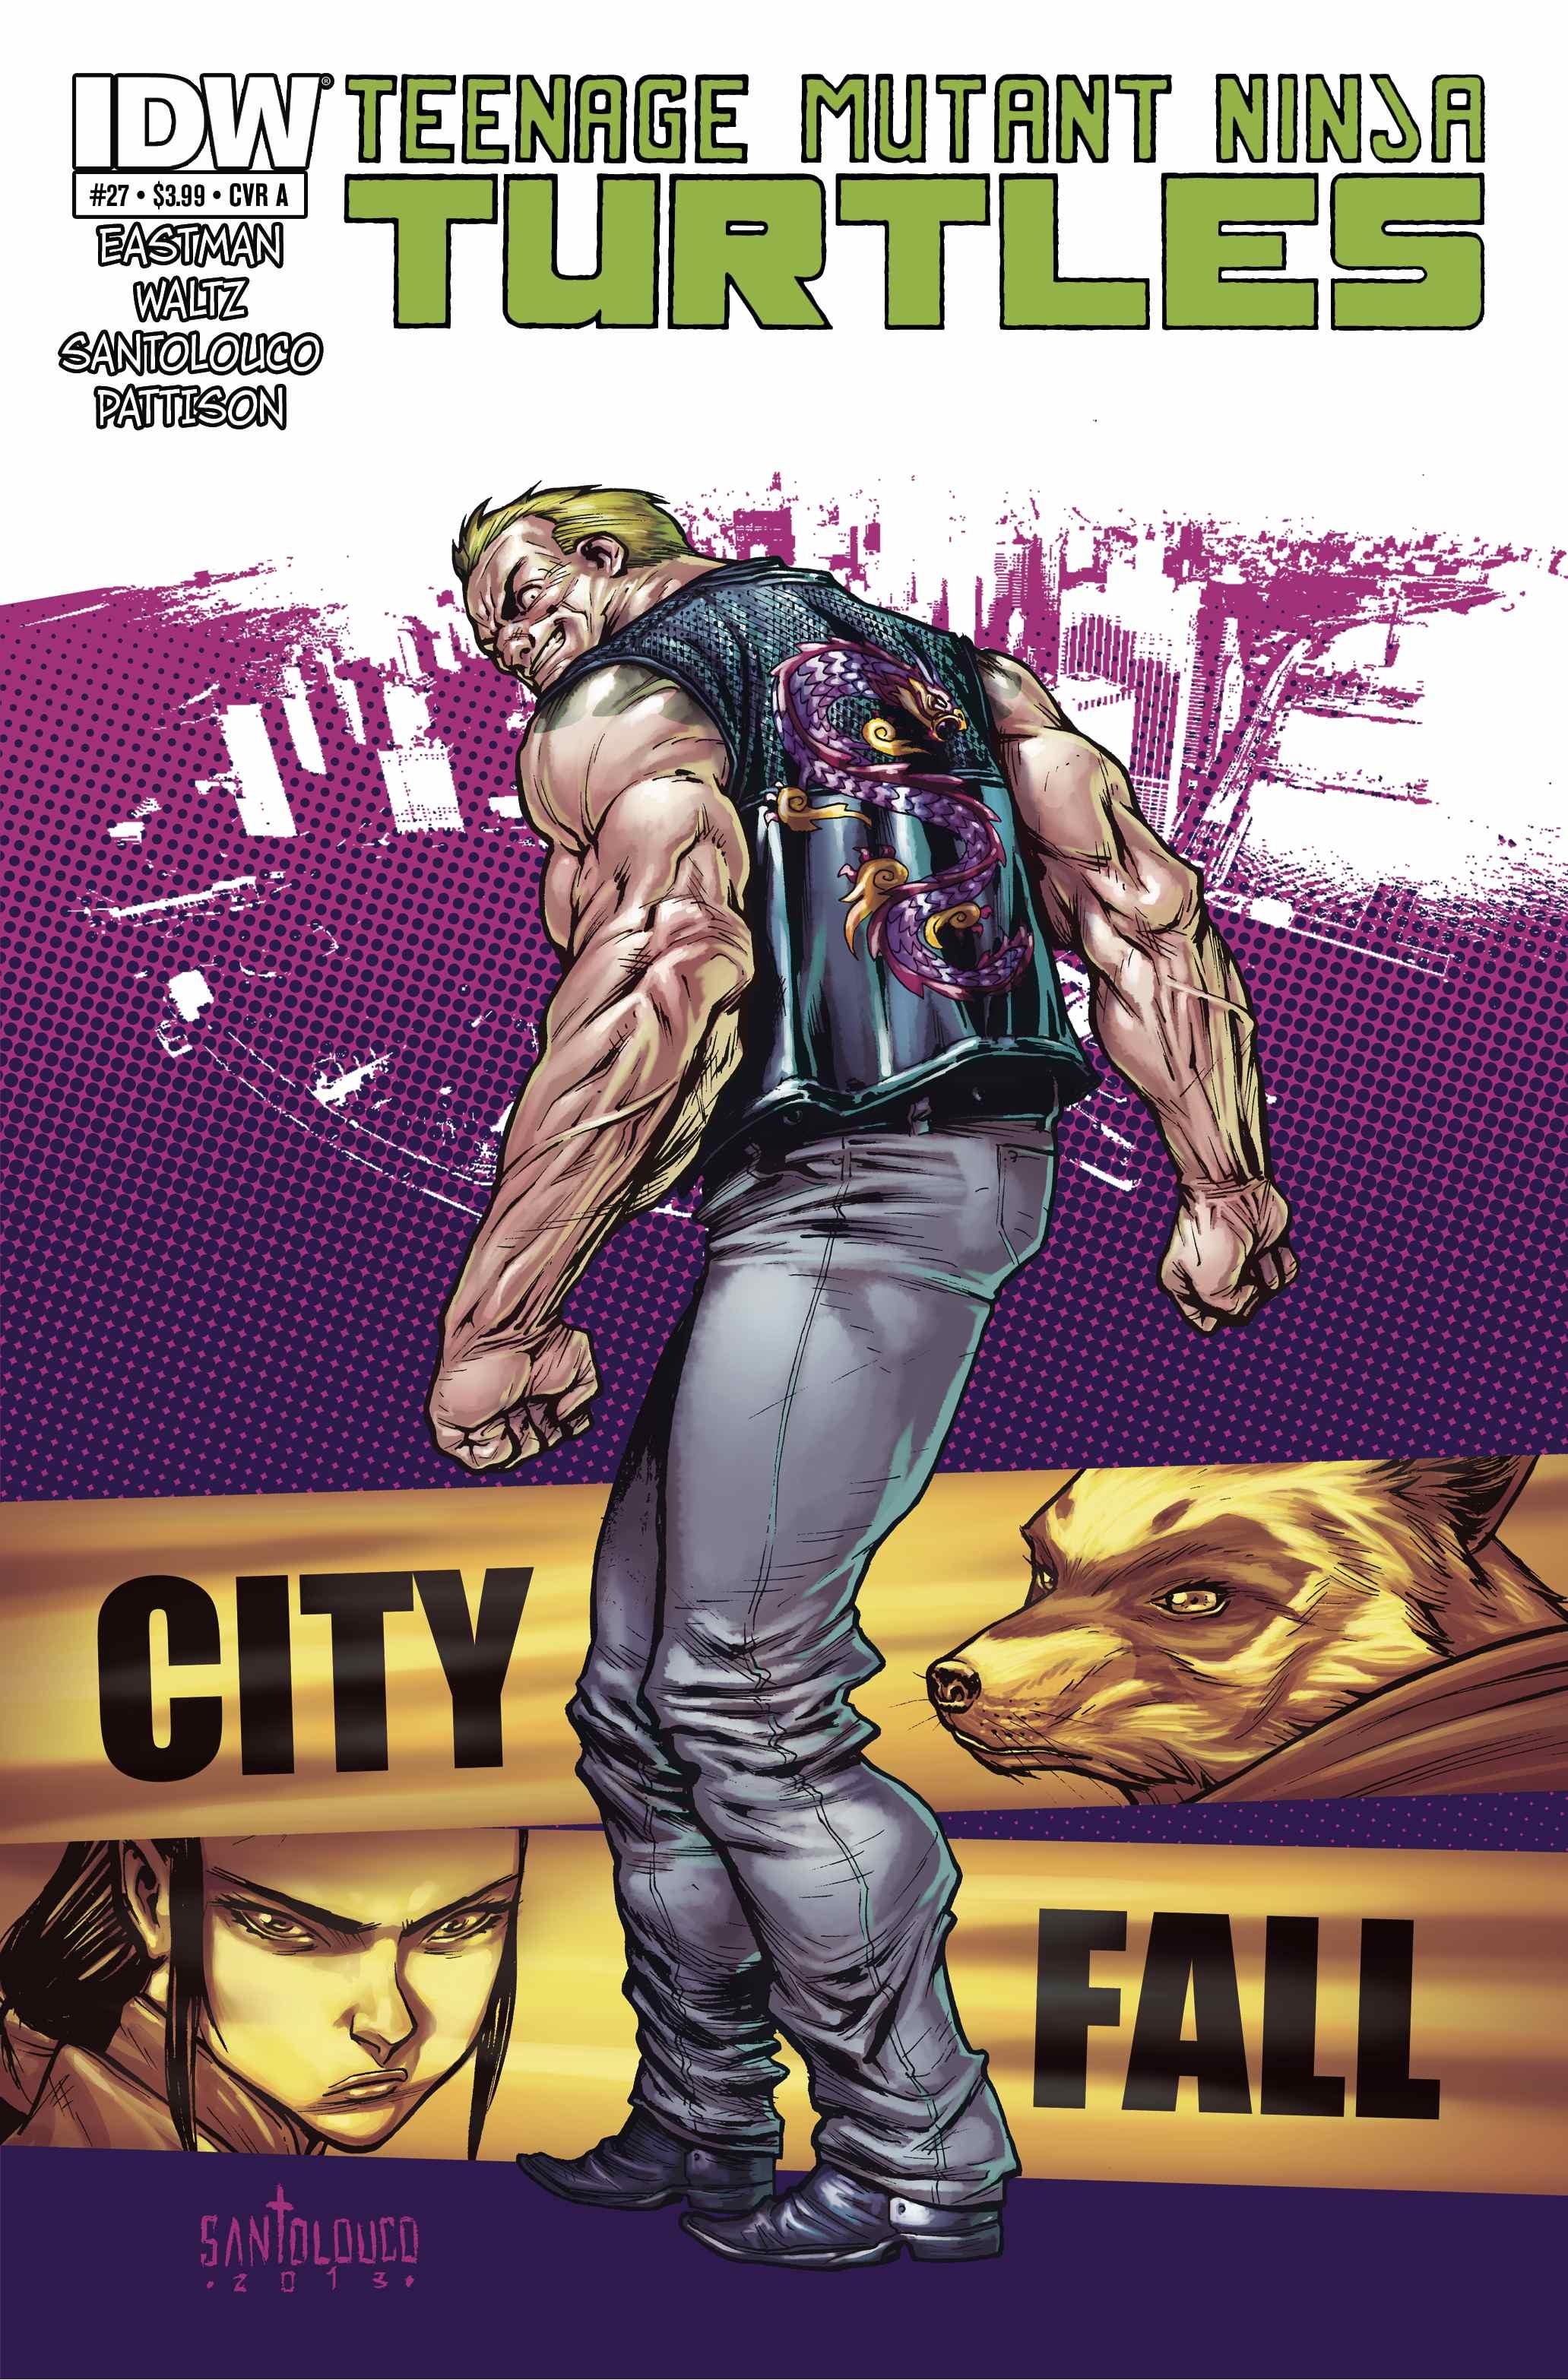 City Fall, part 6